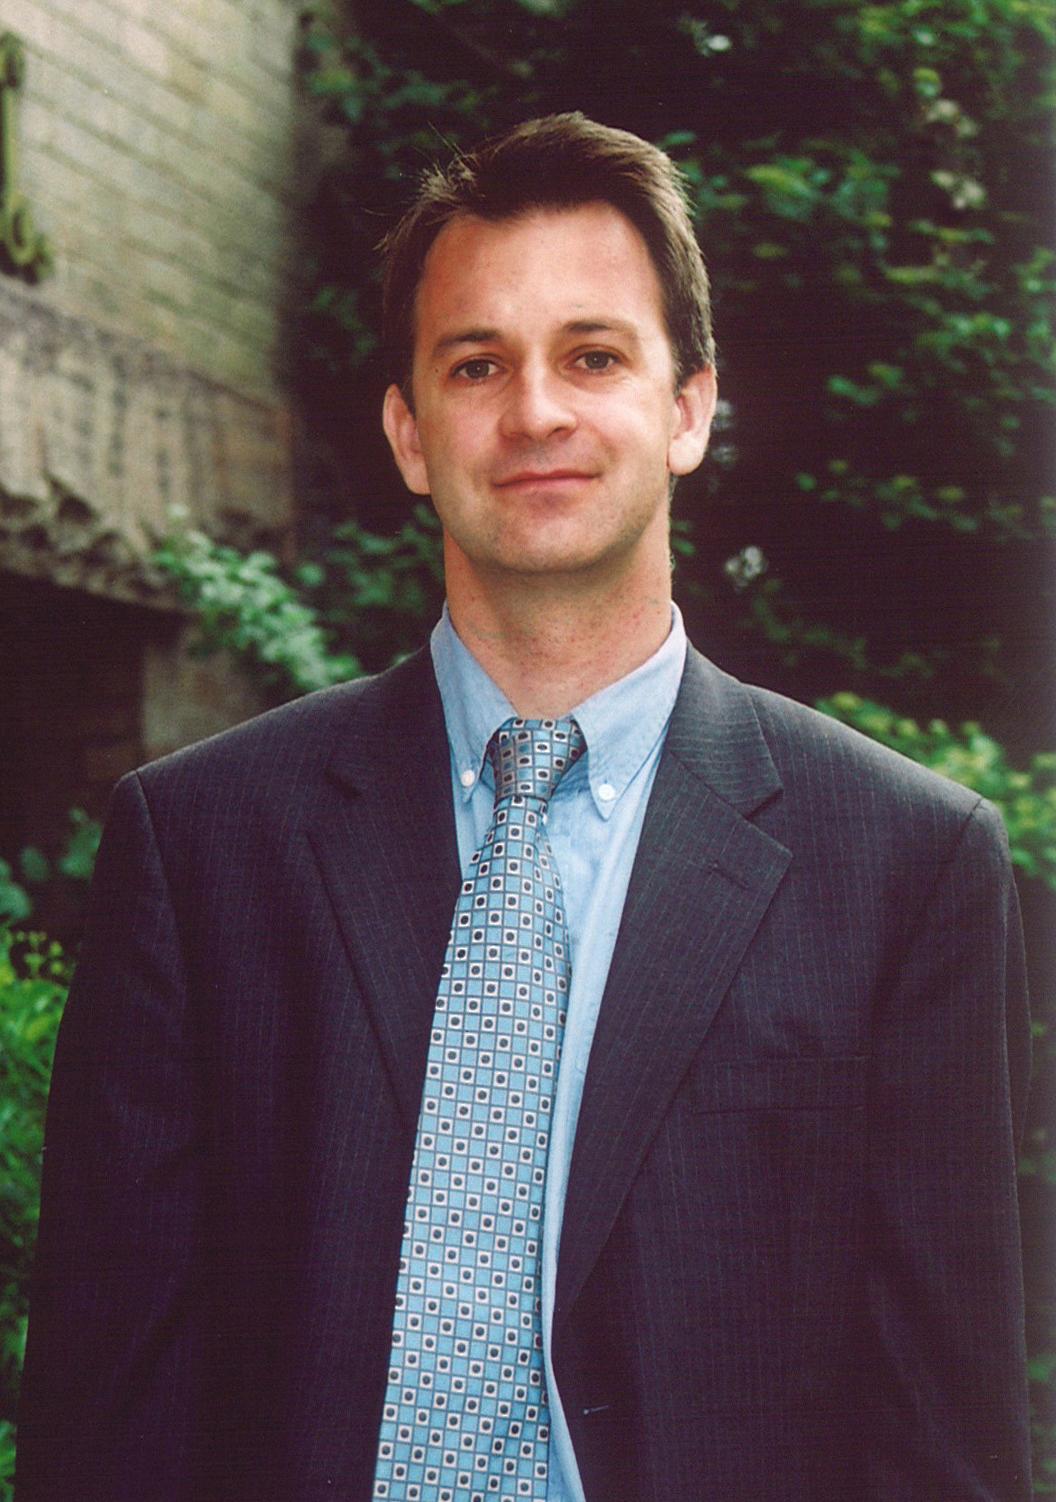 Christopher Hacon, distinguished professor of mathematics at the University of Utah